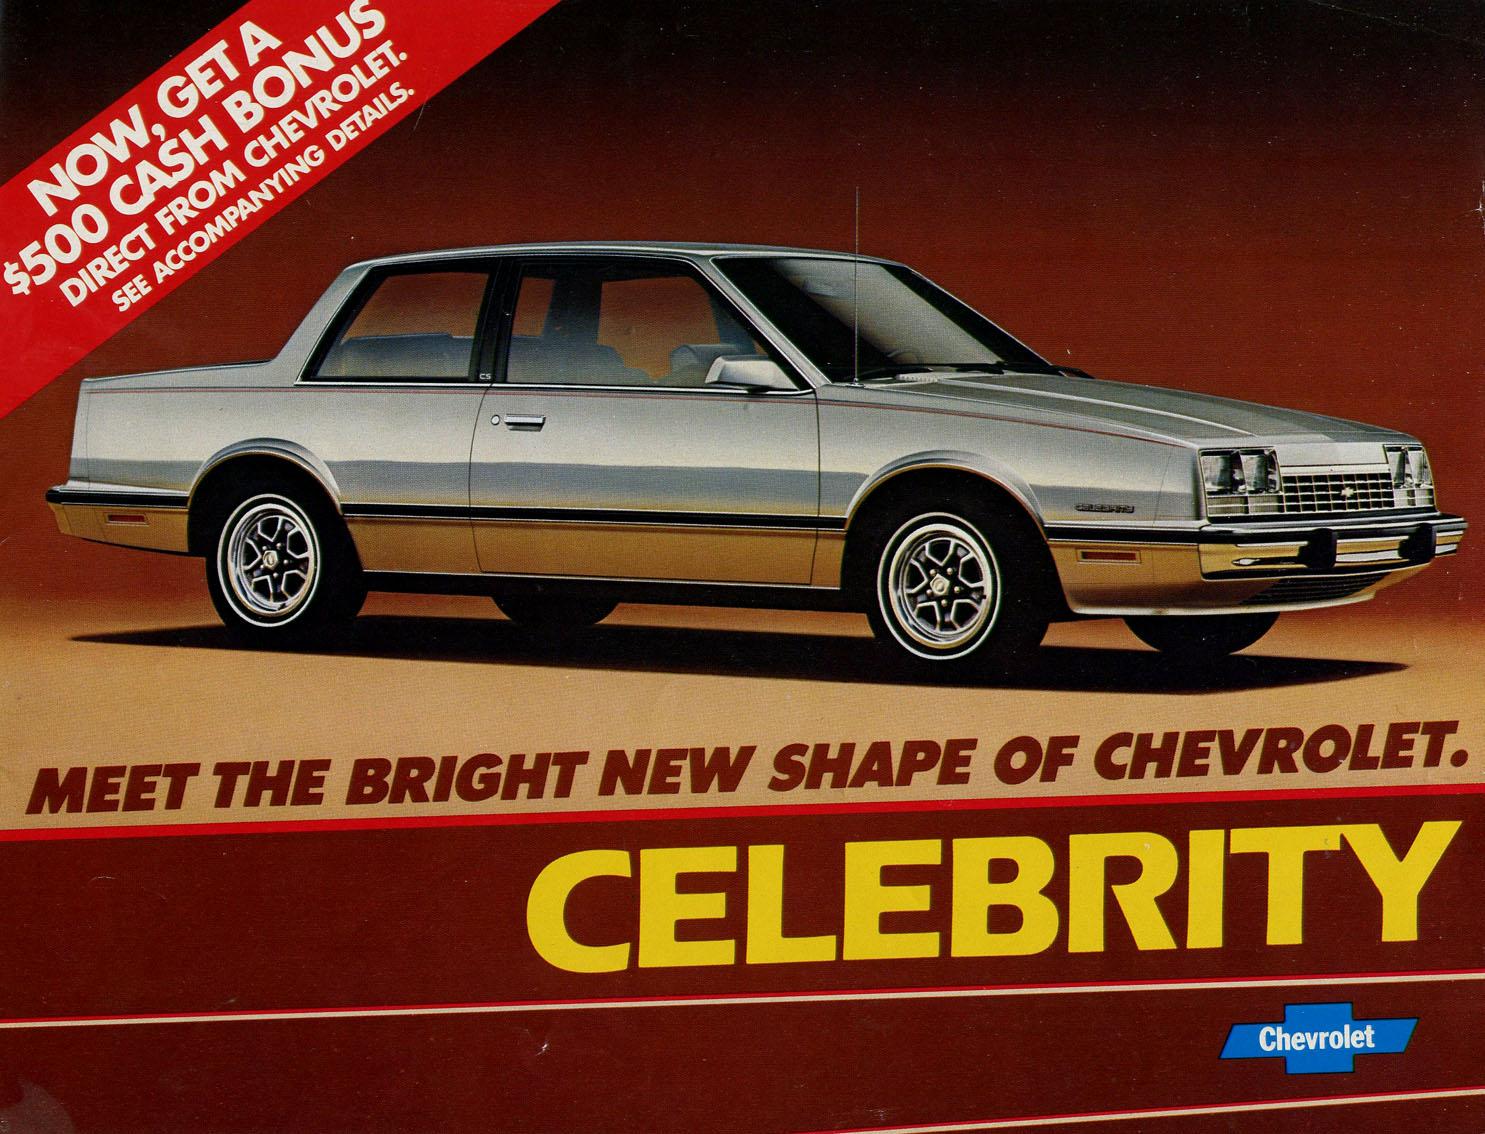 83 chevrolet celebrity gold